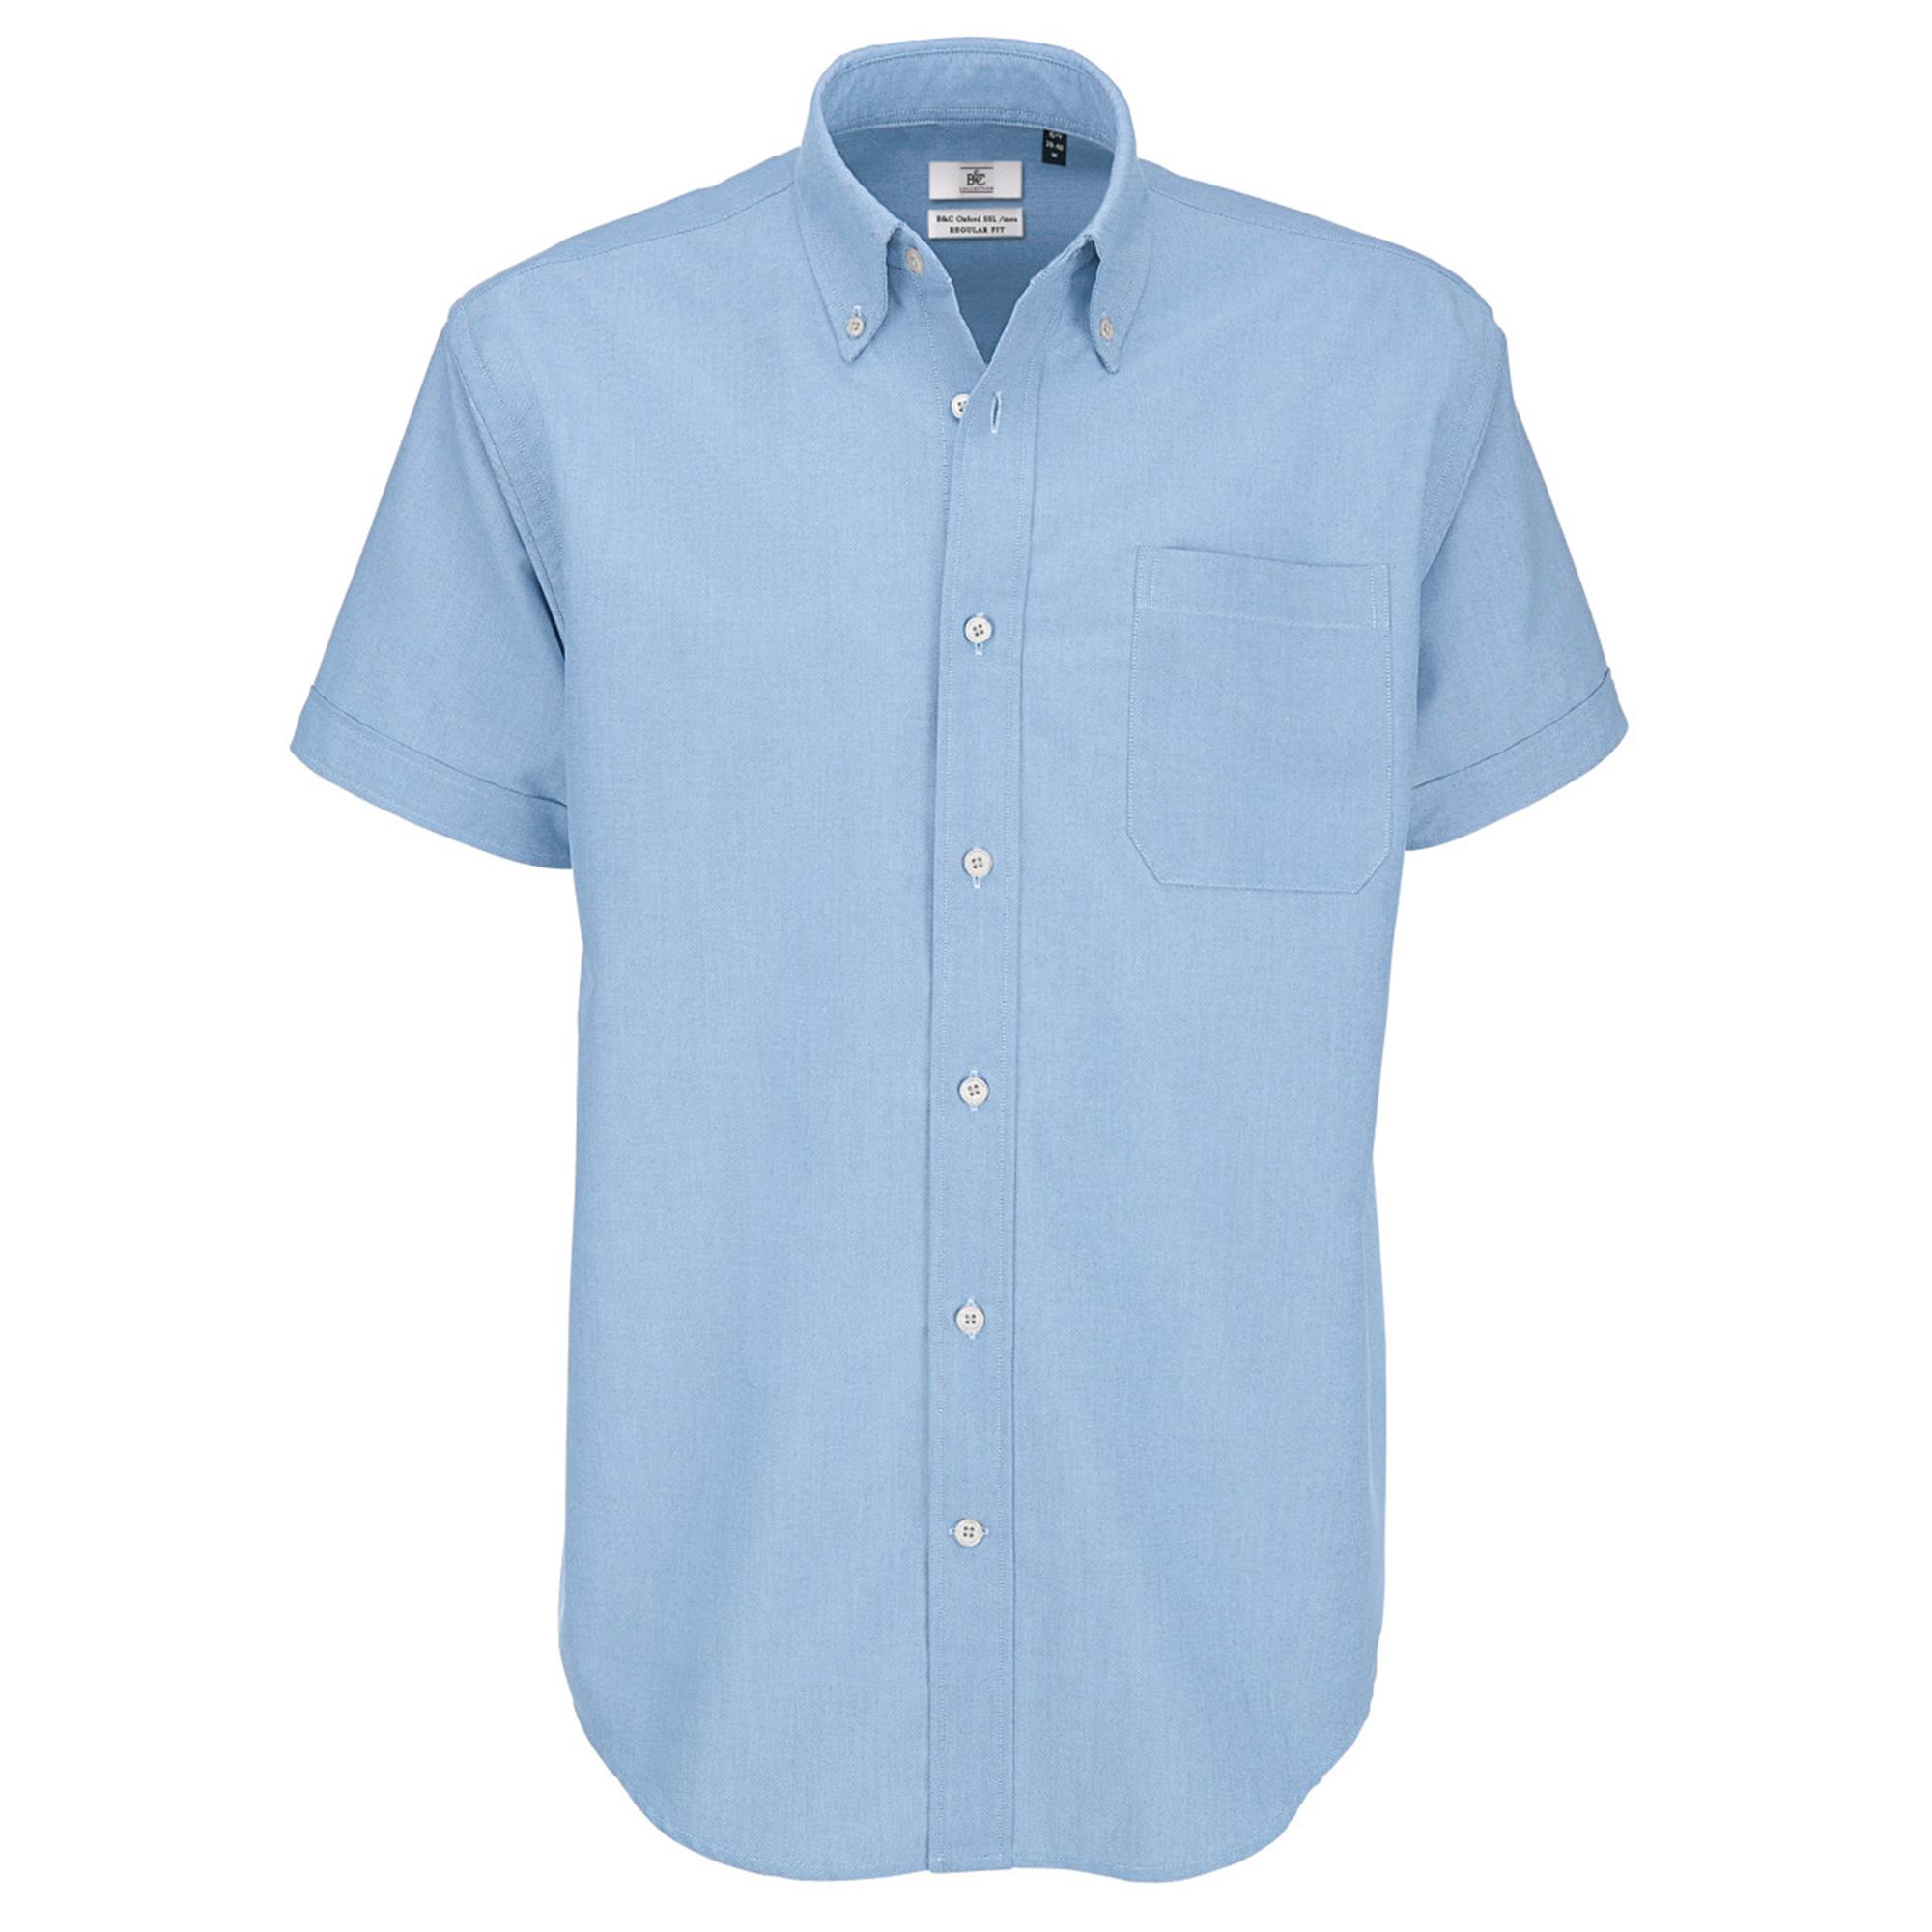 B&C Mens Oxford Short Sleeve Shirt / Mens Shirts (M) (Oxford Blue)